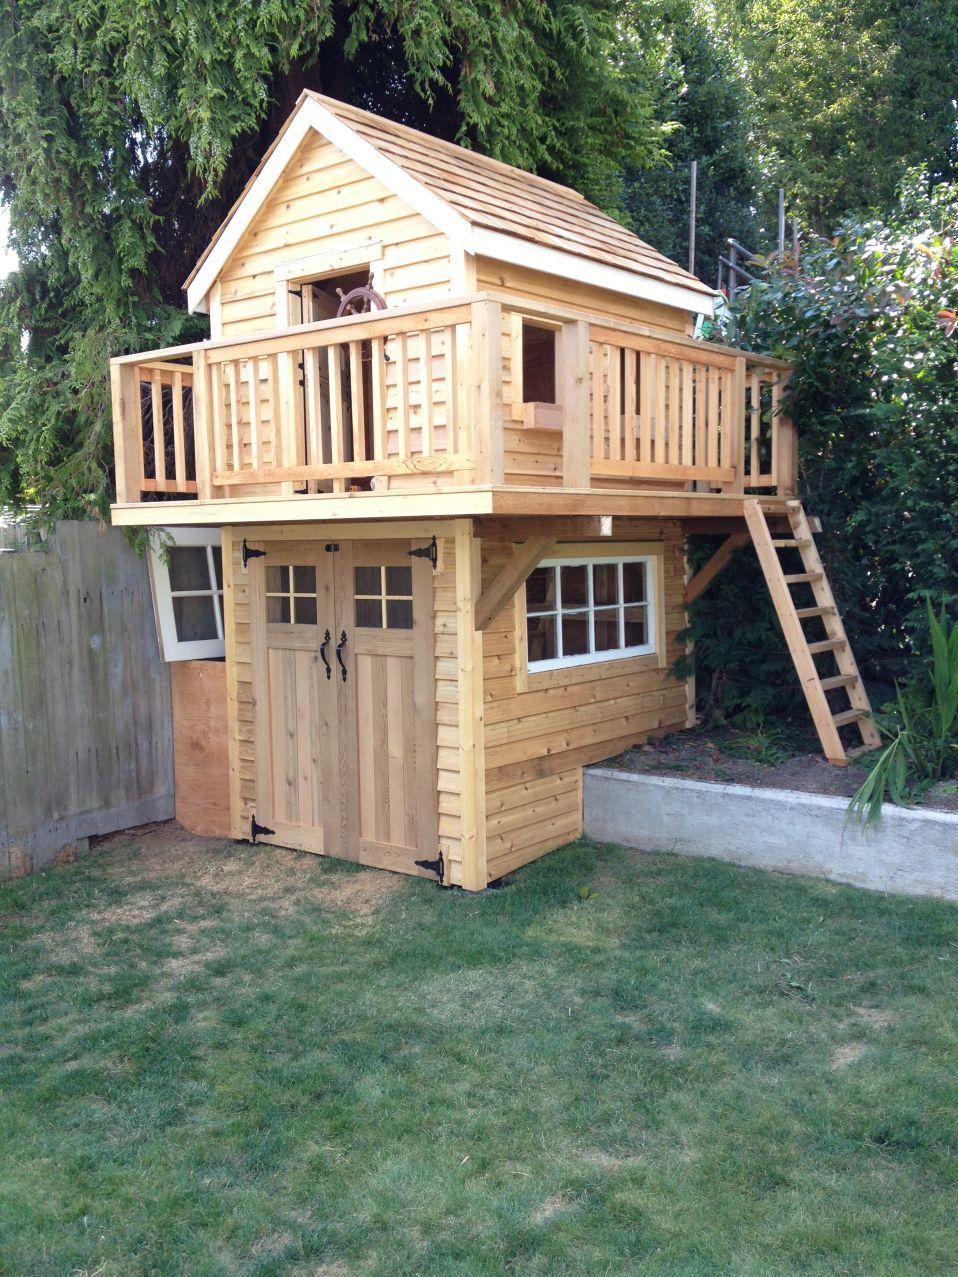 Gallery In 2020 Backyard Farmer Play Houses Chickens Backyard